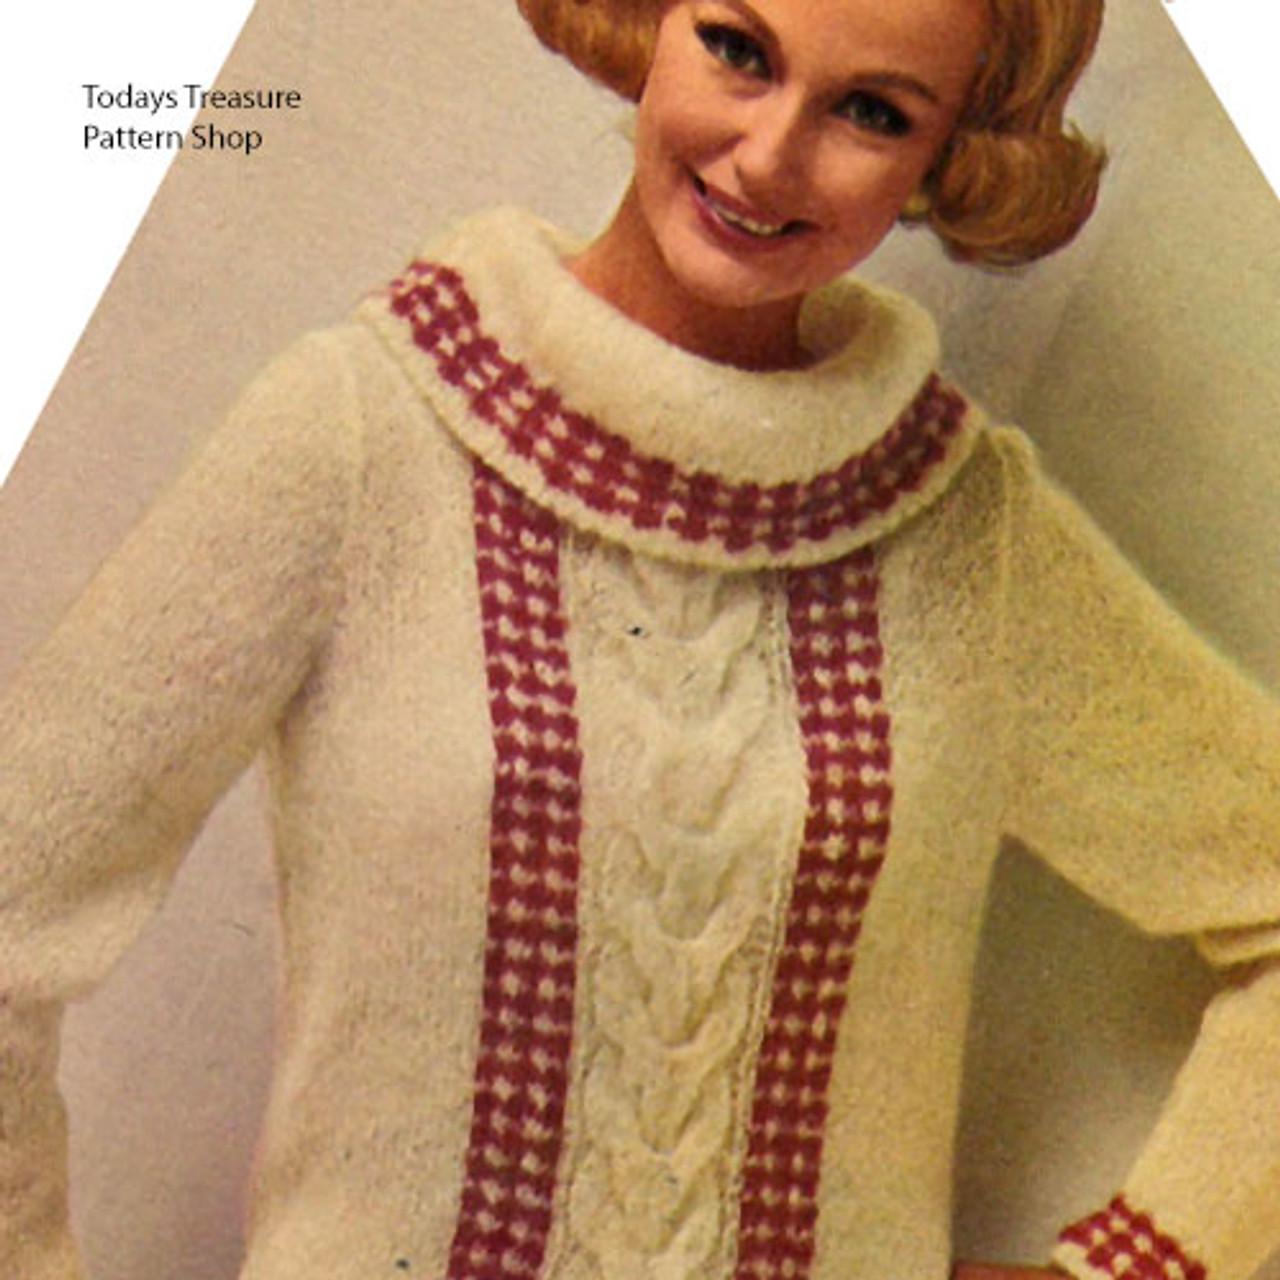 Vintage Pullover in Reynolds Mohair Yarn